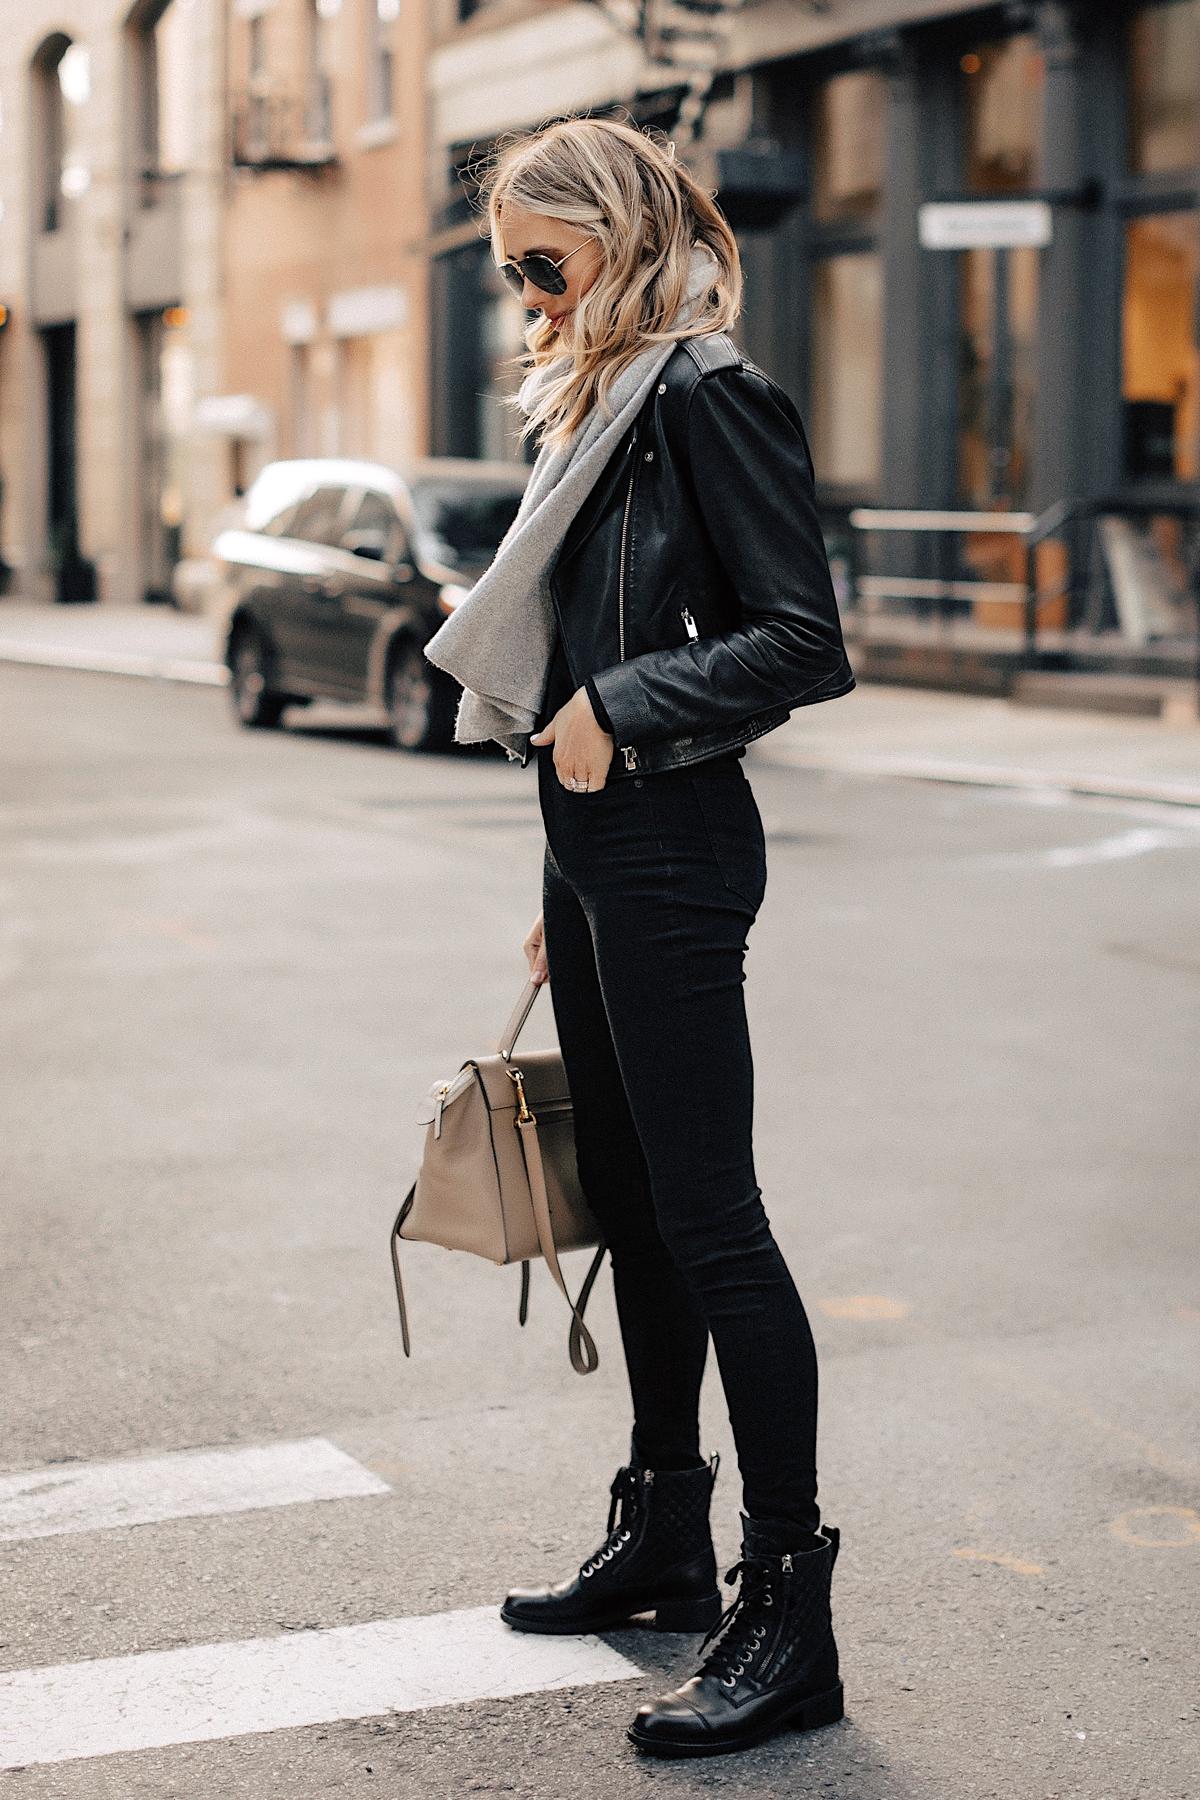 Fashion Jackson Wearing Black Leather Jacket Black Skinny Jeans Chanel Combat Boots Grey Scarf NYC Street Style